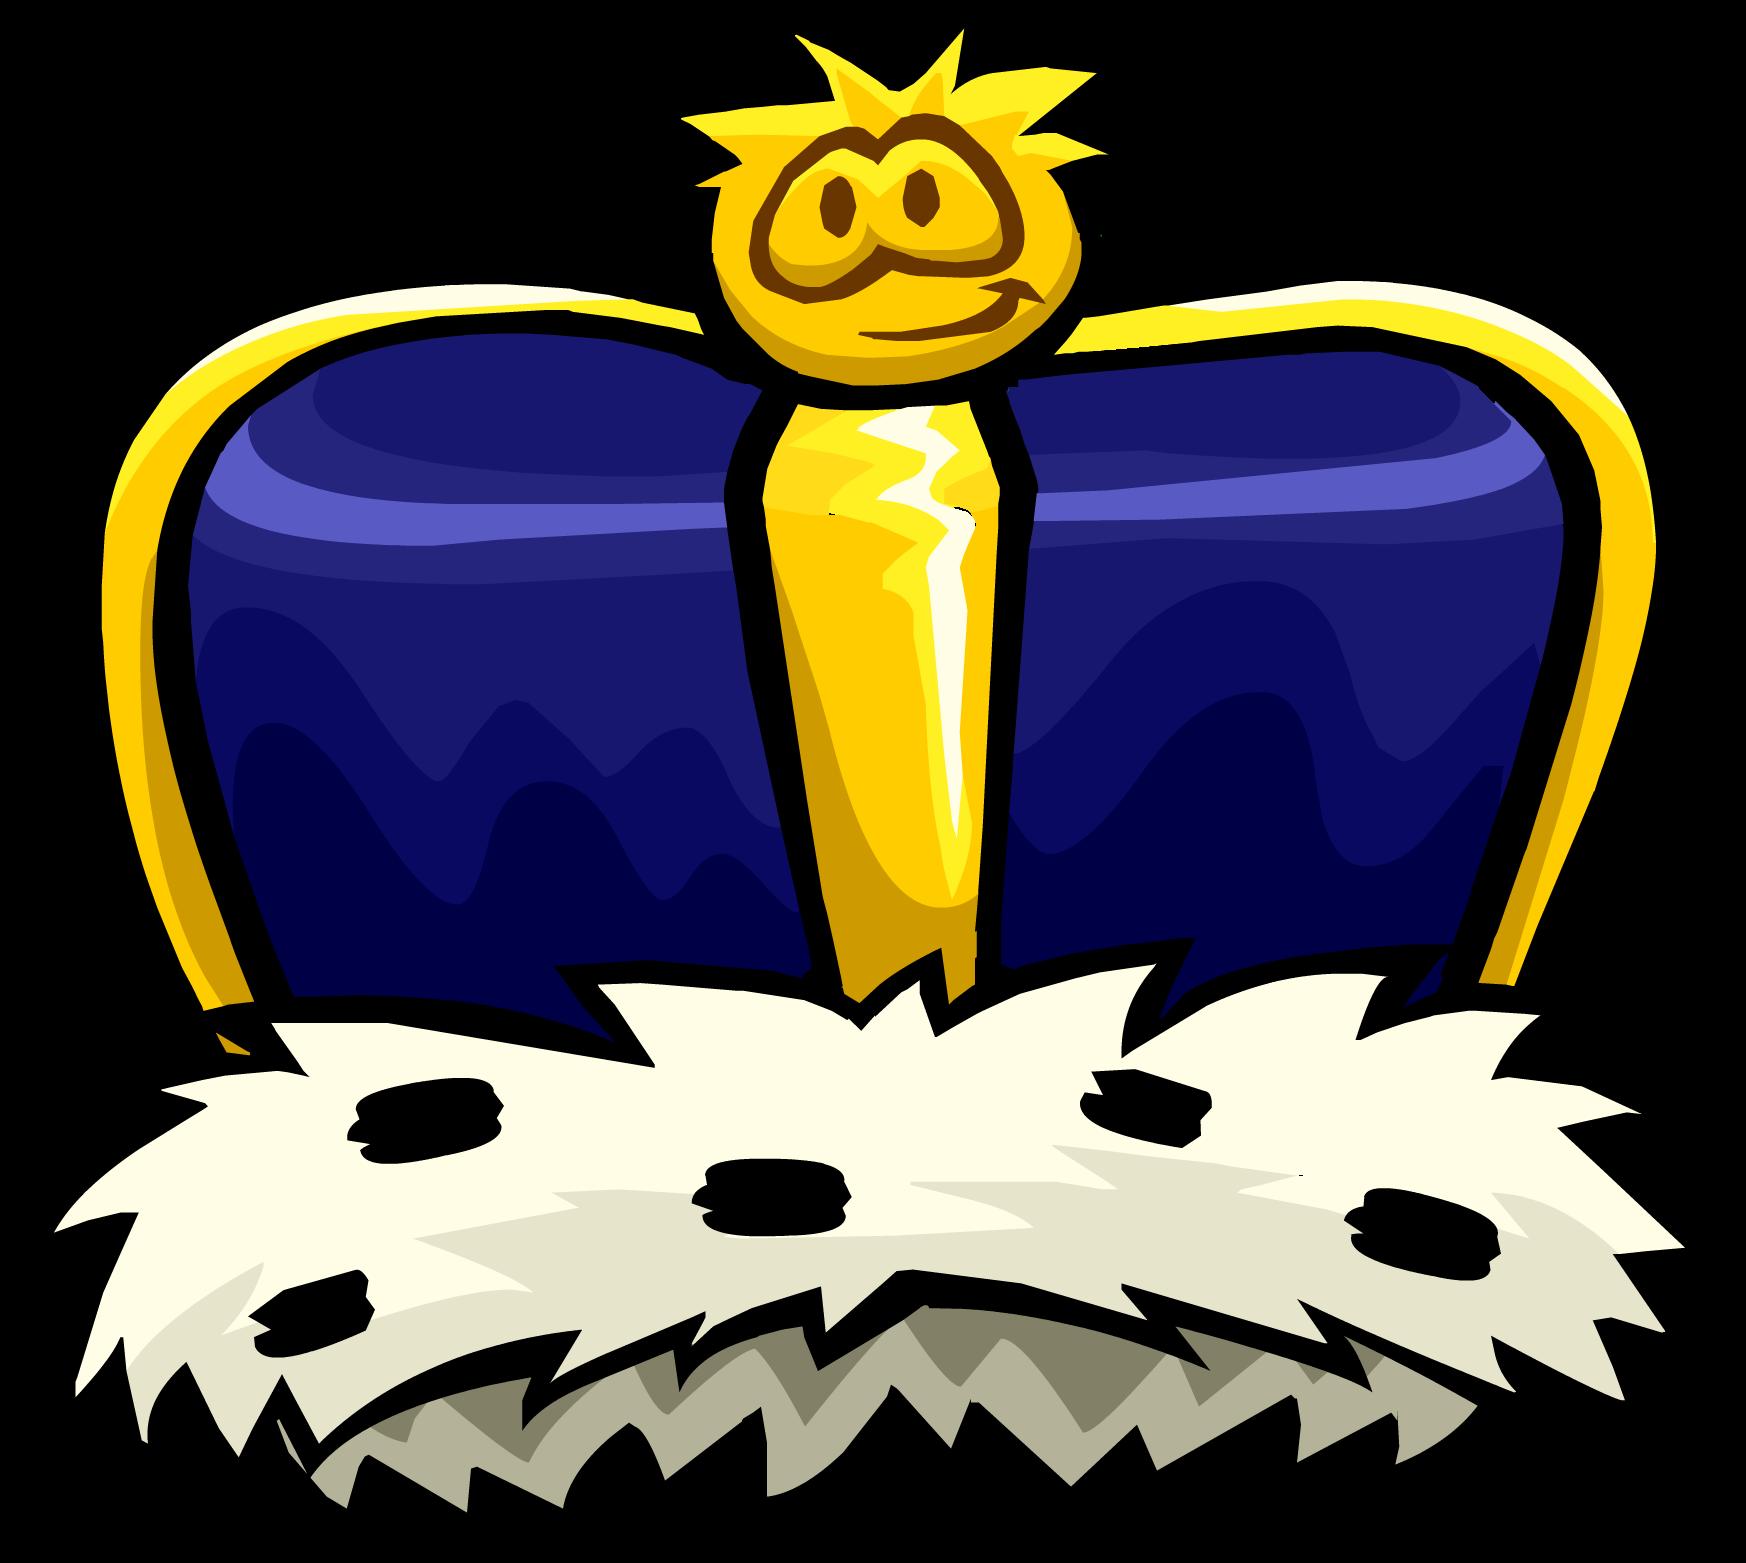 Graffiti clipart crown. Image king s blue